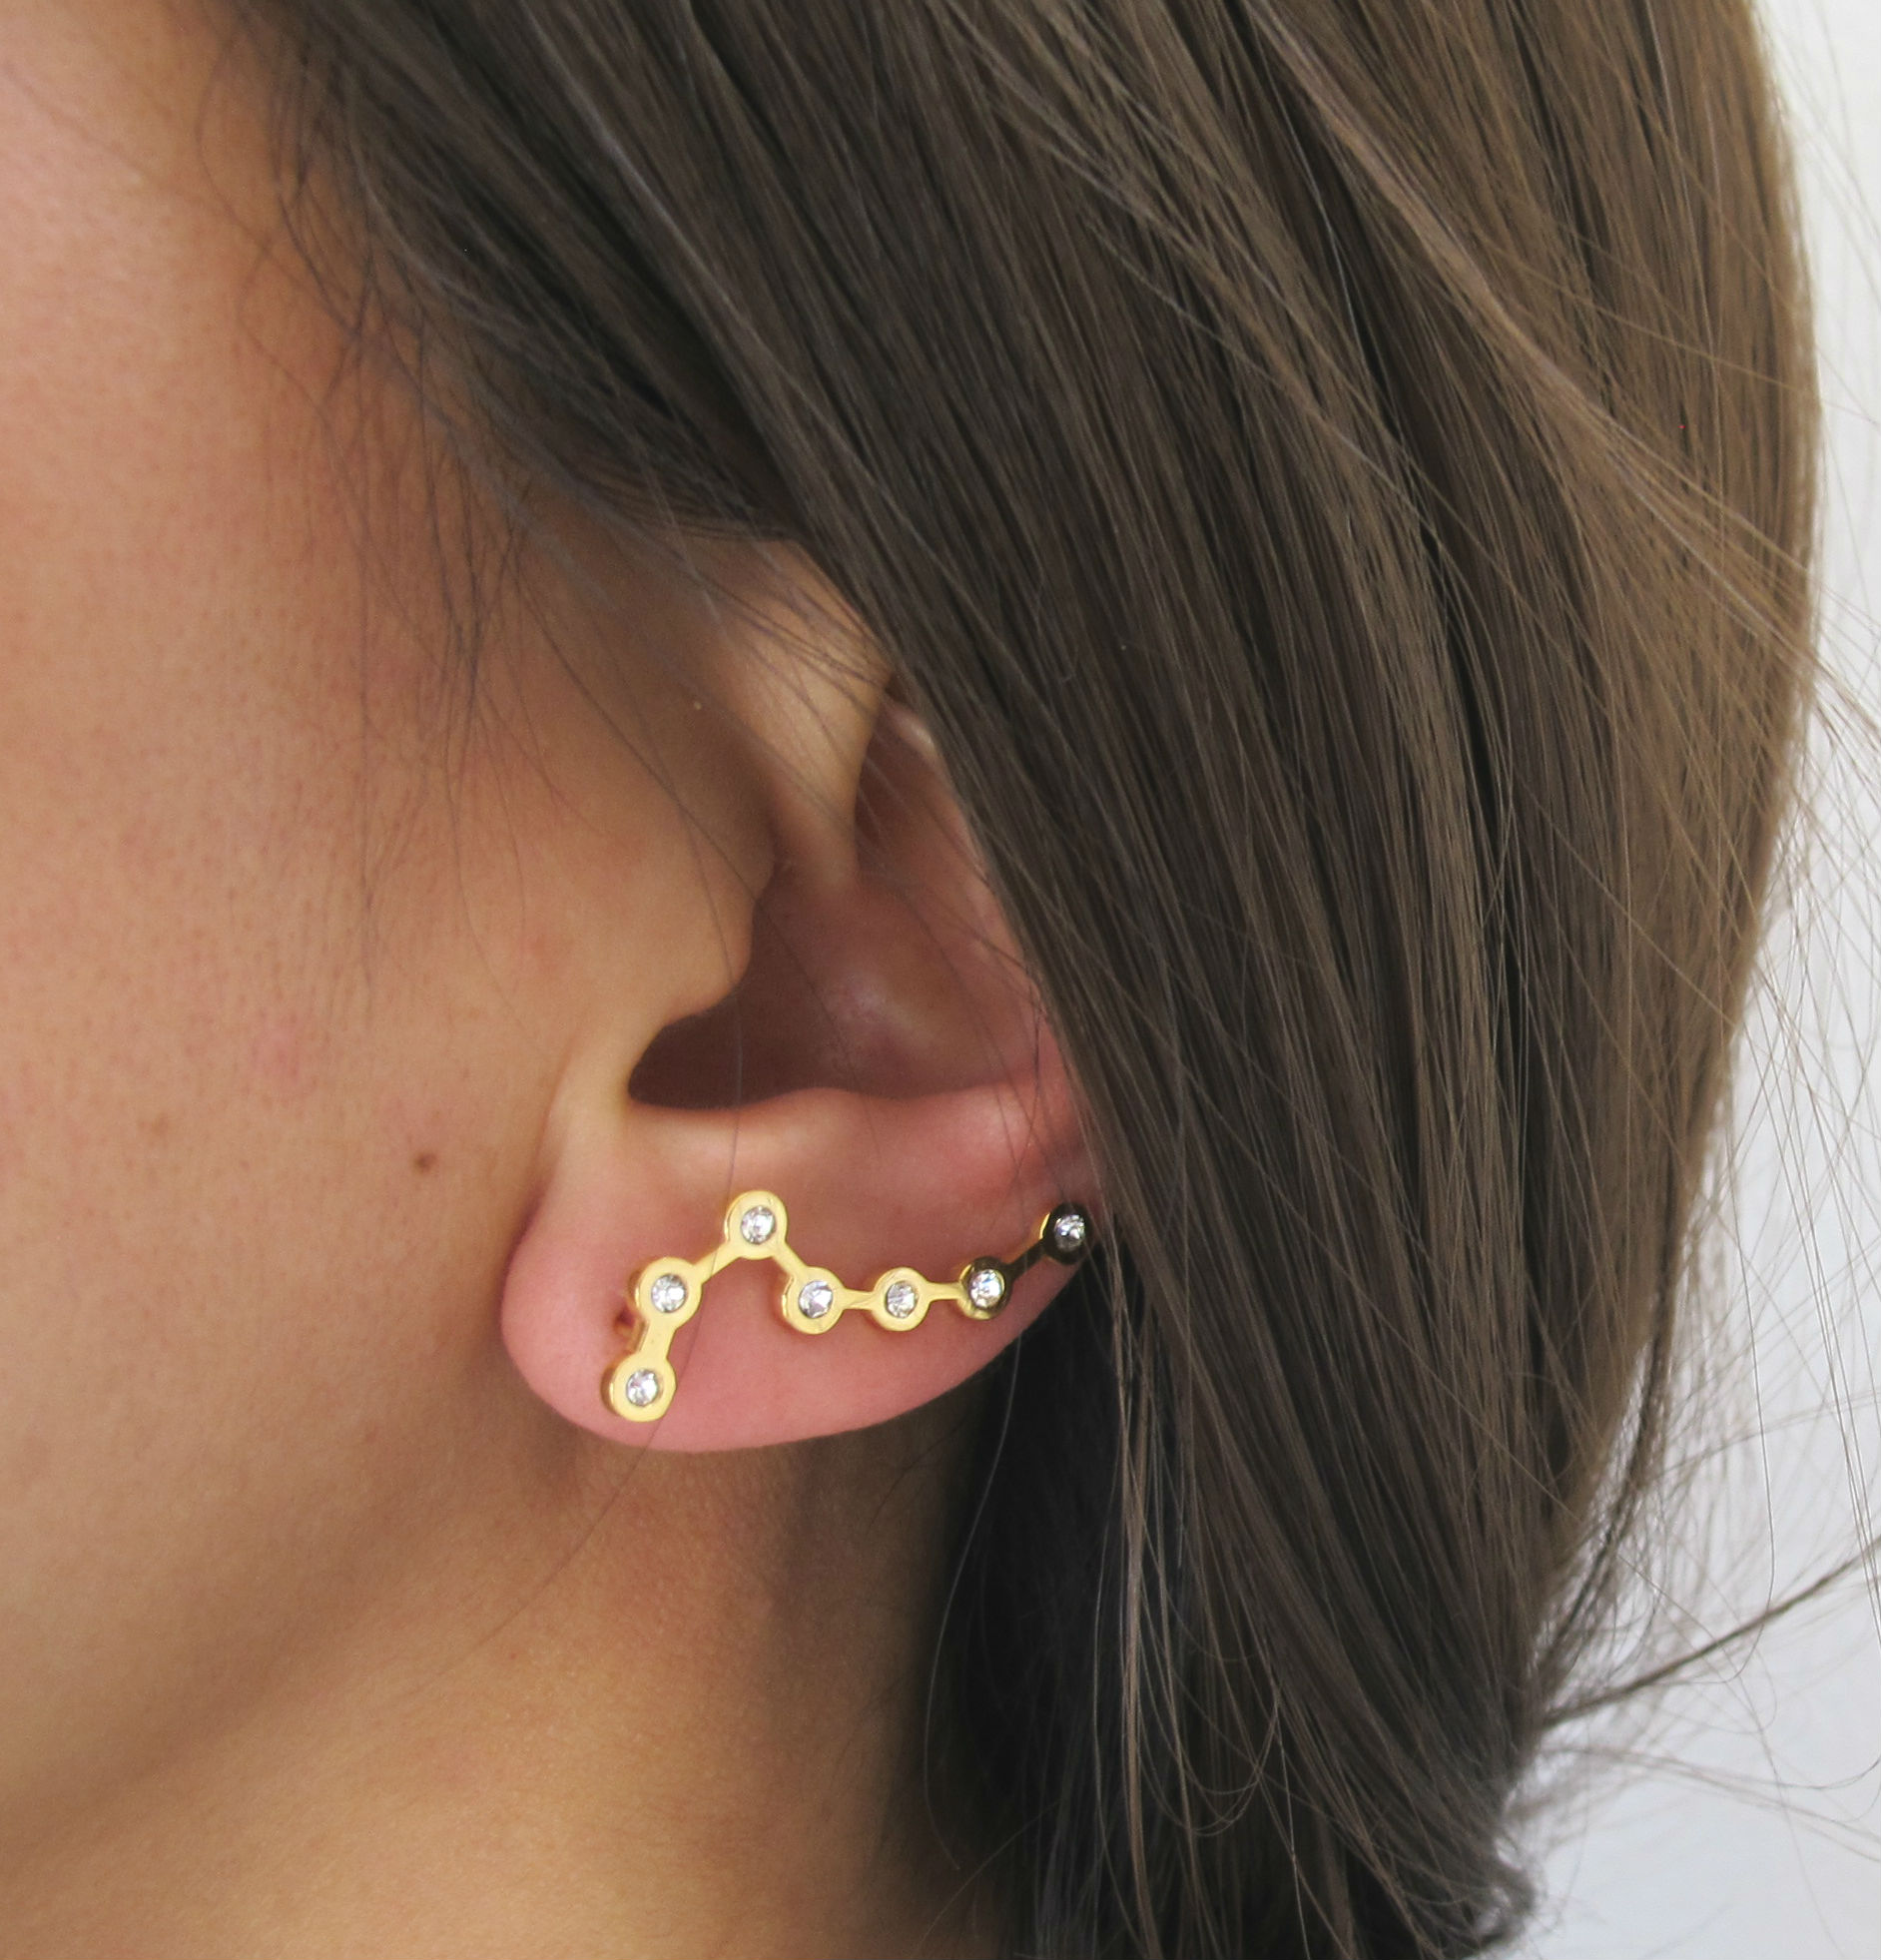 Big Dipper Earring - Single Ear Crawler, Star Ear Crawler, Big ...